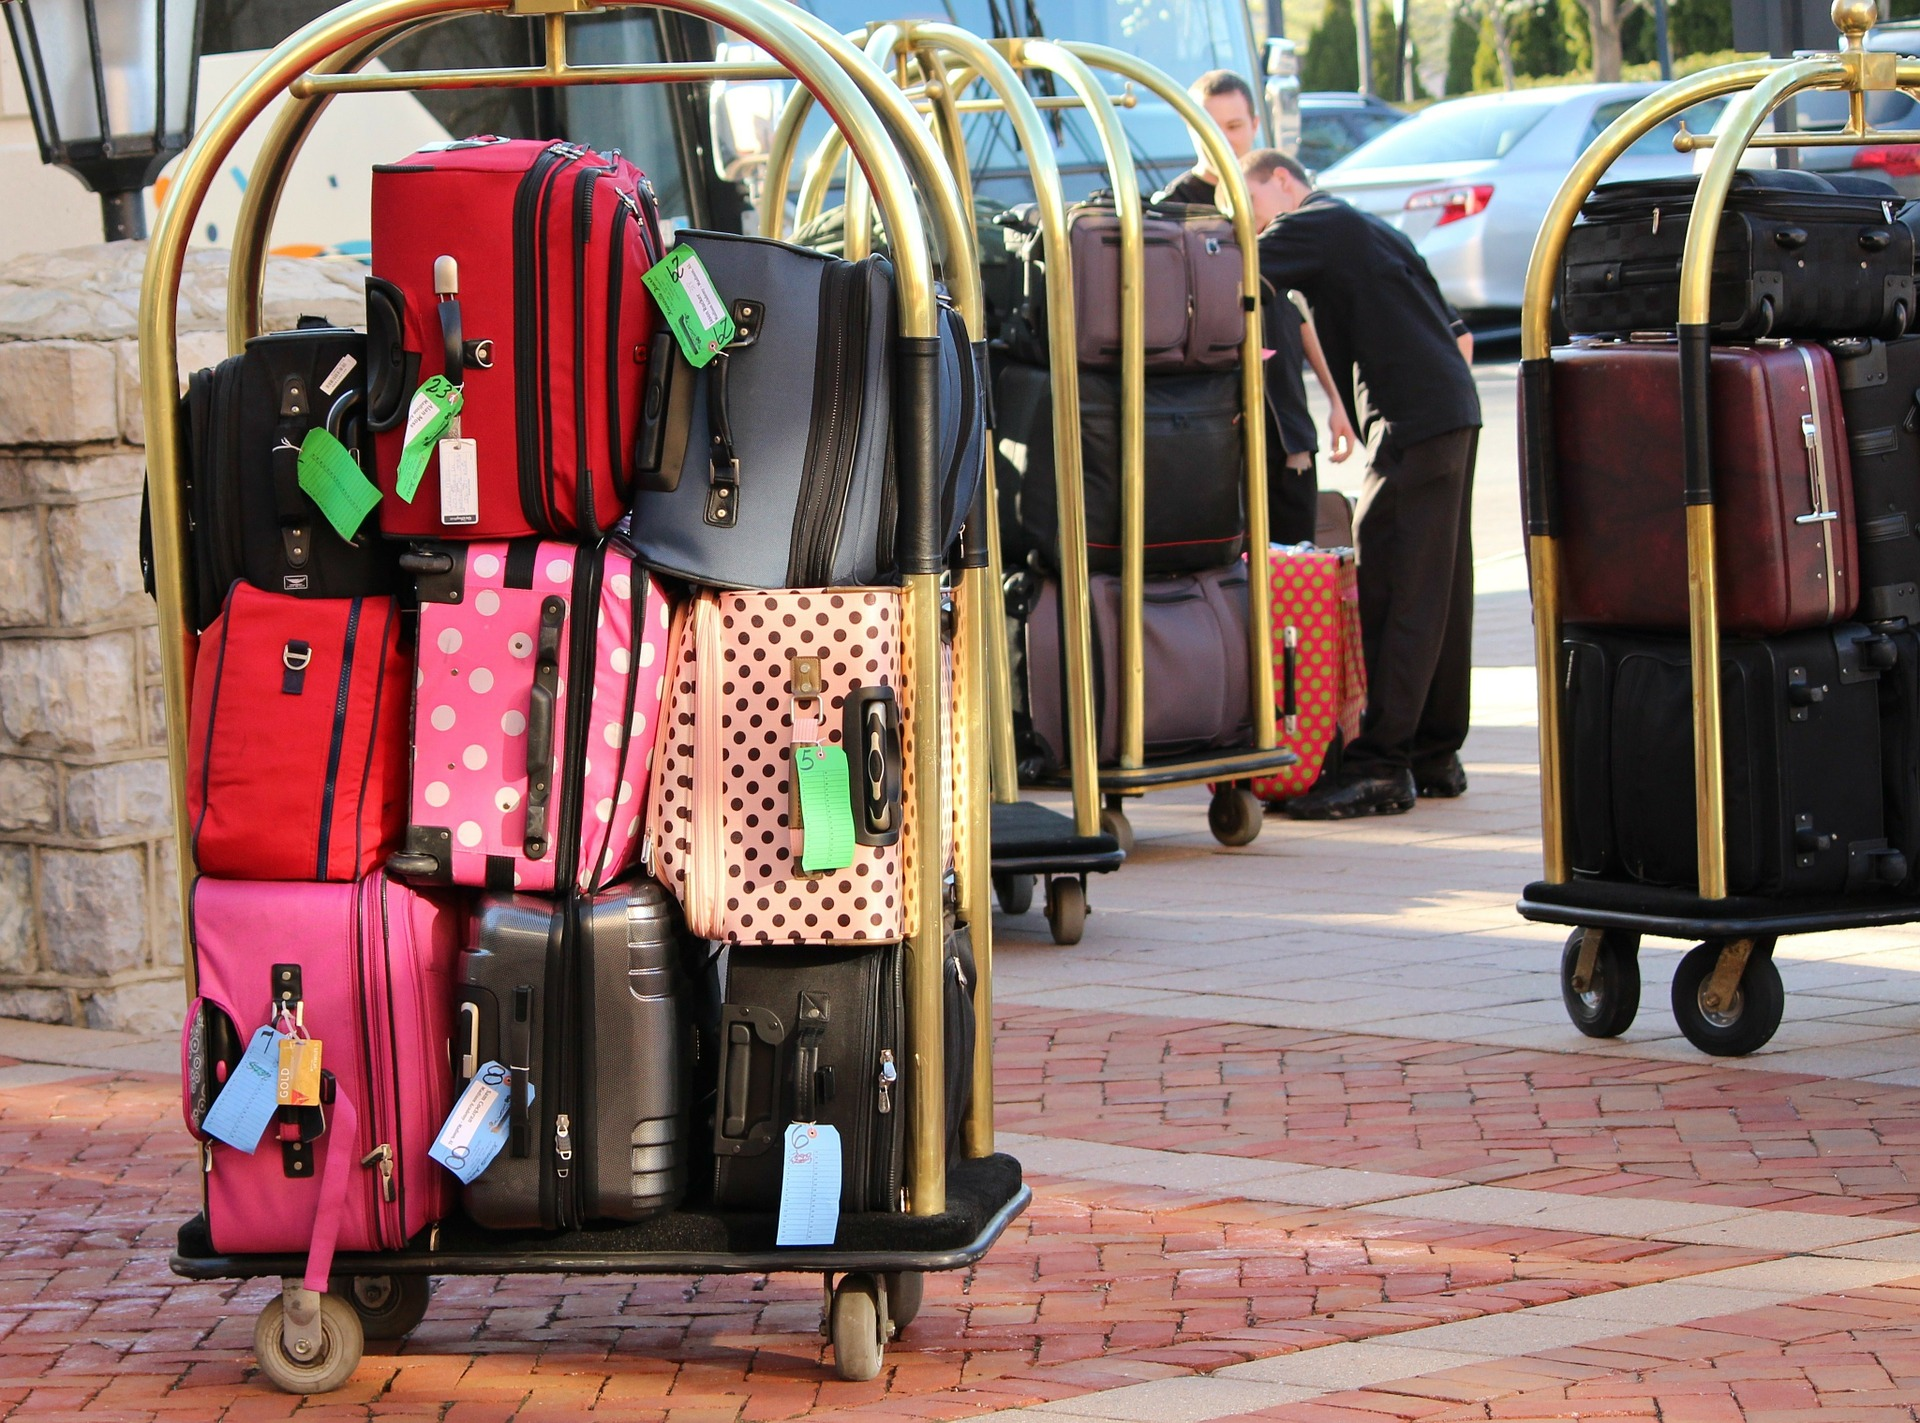 bellman-luggage-cart-104031_1920.jpg